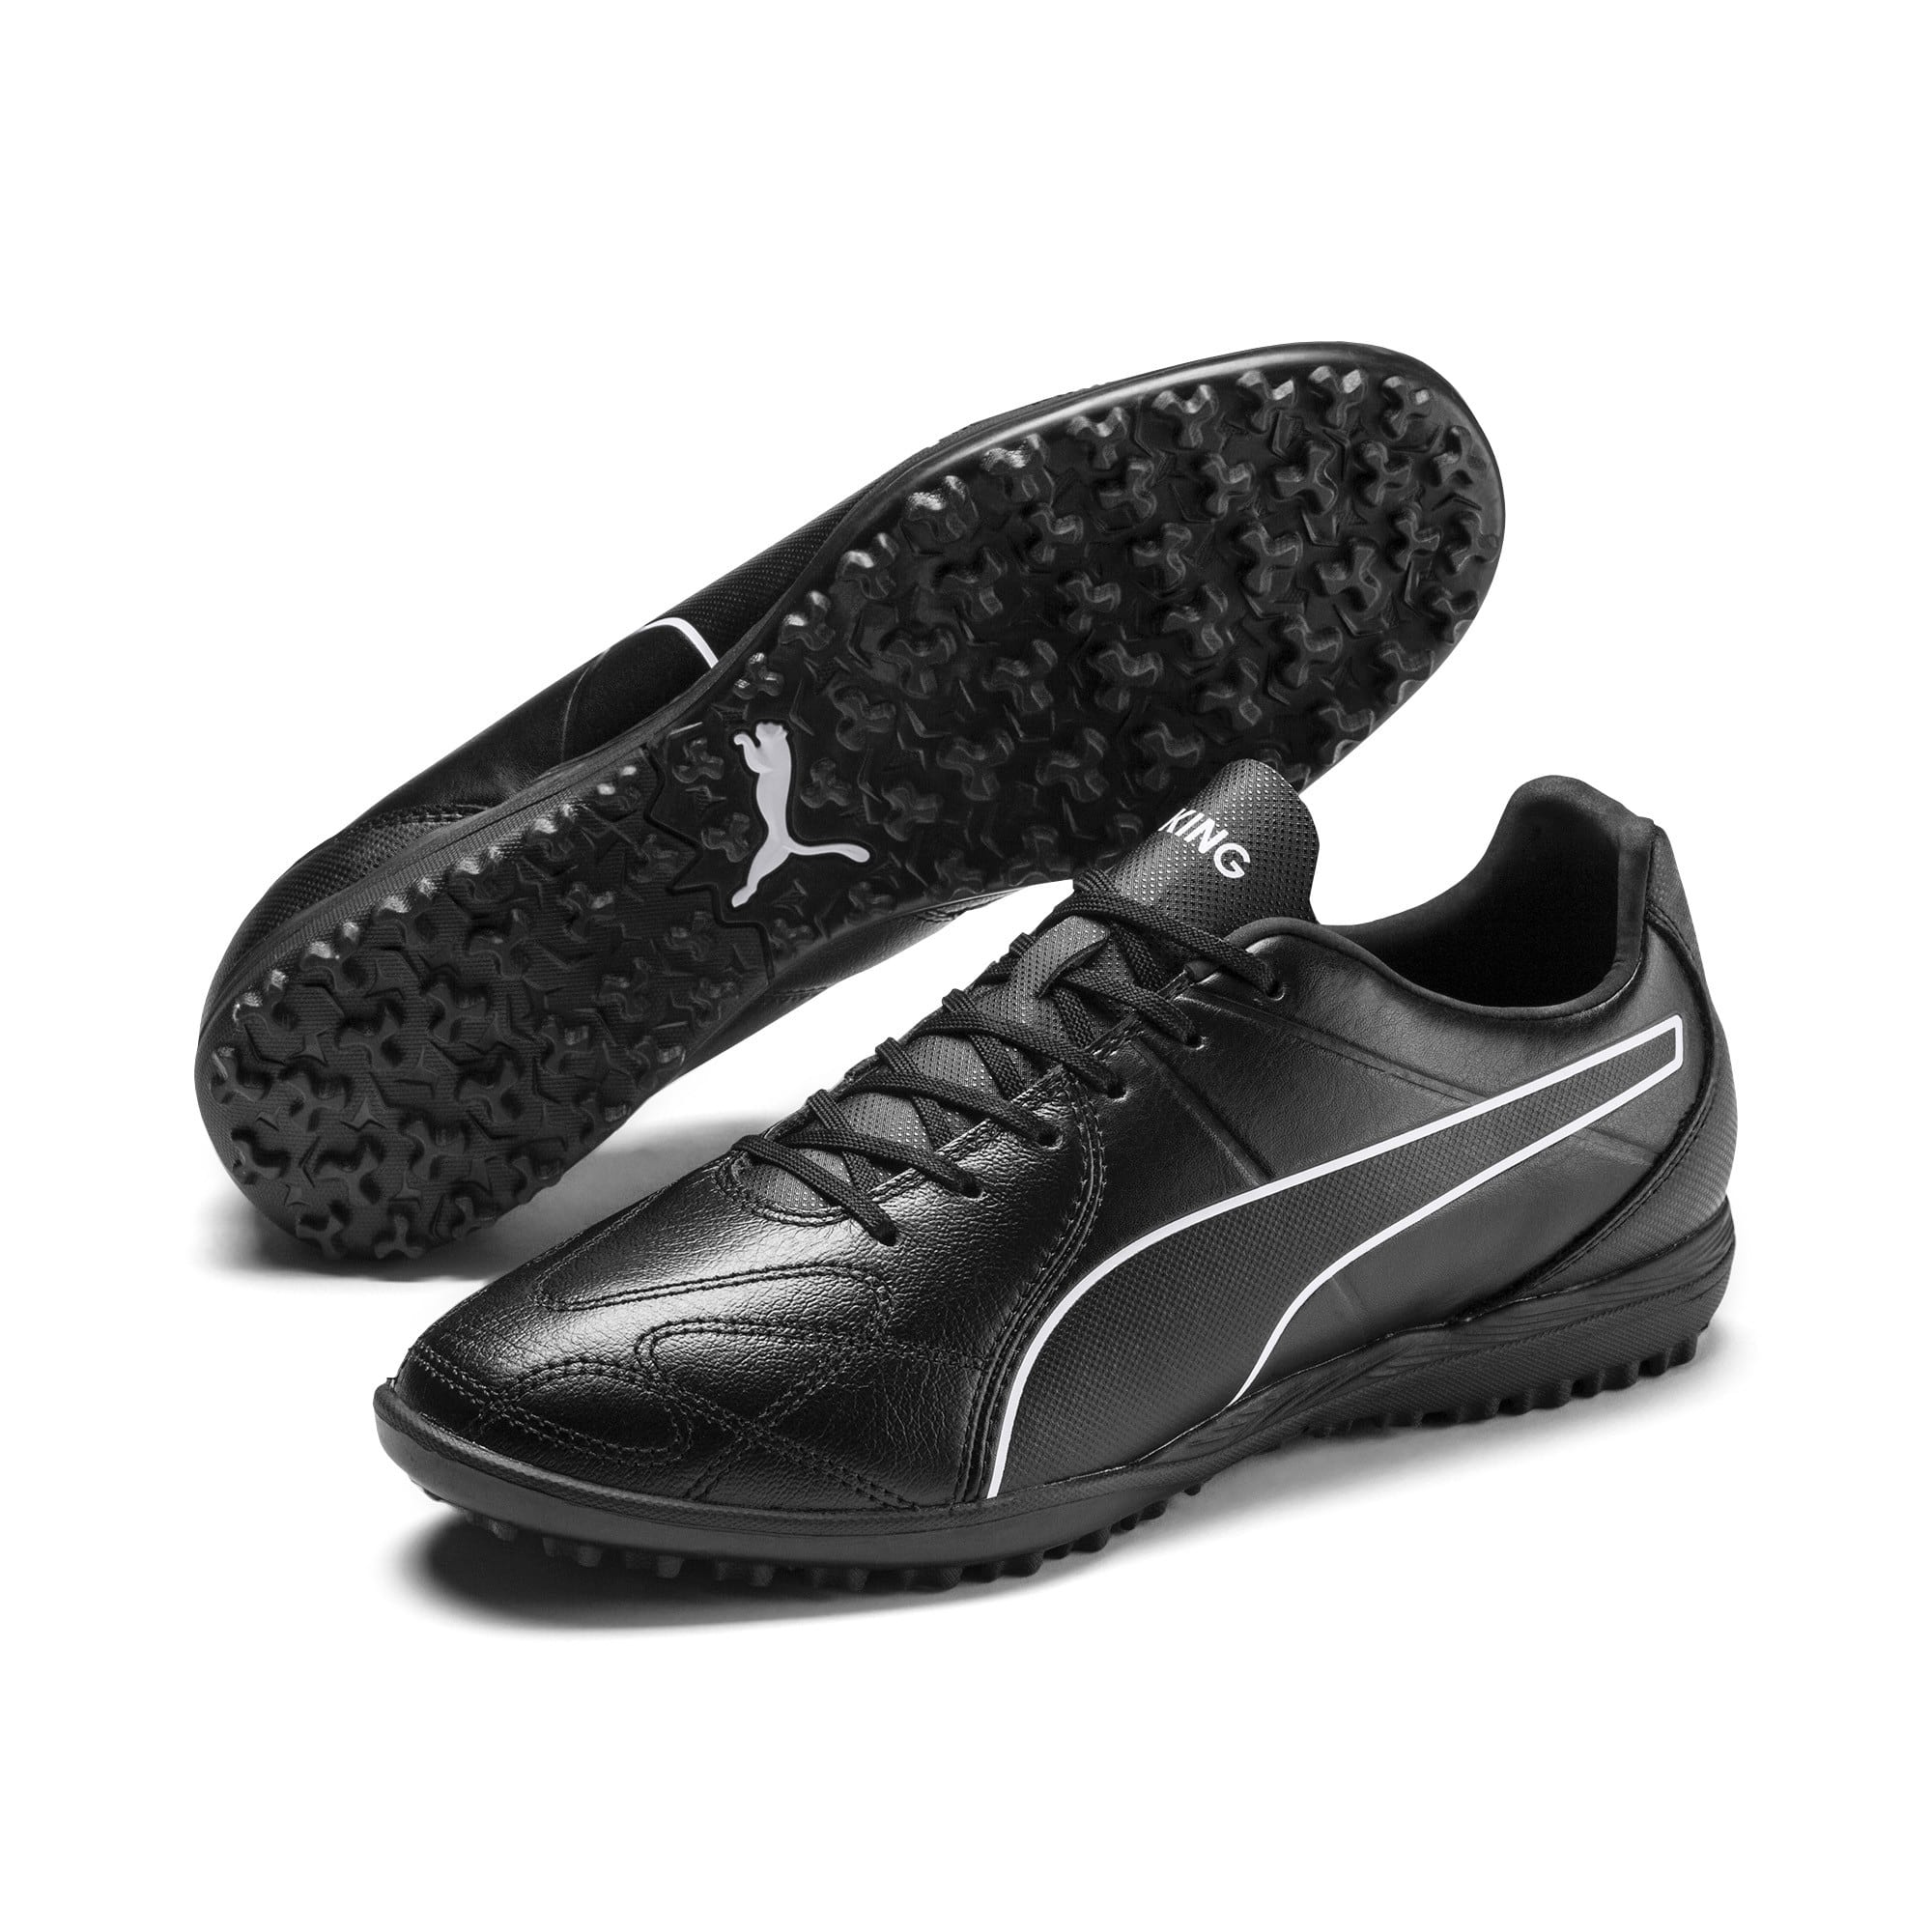 Thumbnail 3 of KING Hero TT Football Boots, Puma Black-Puma White, medium